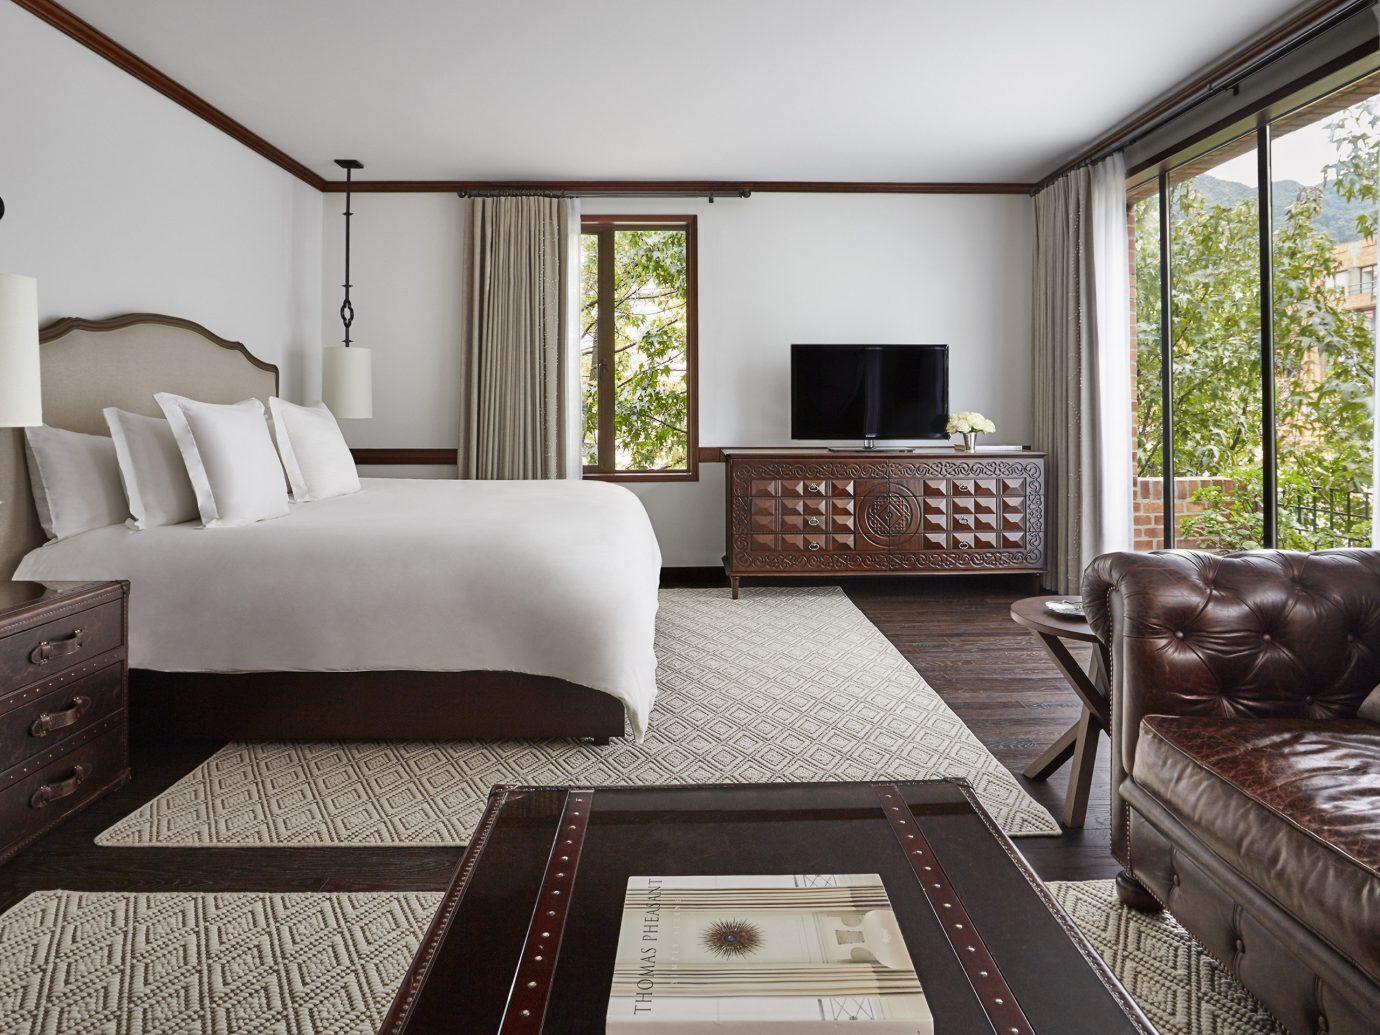 Bedroom at Four Seasons Hotel Casa Medina